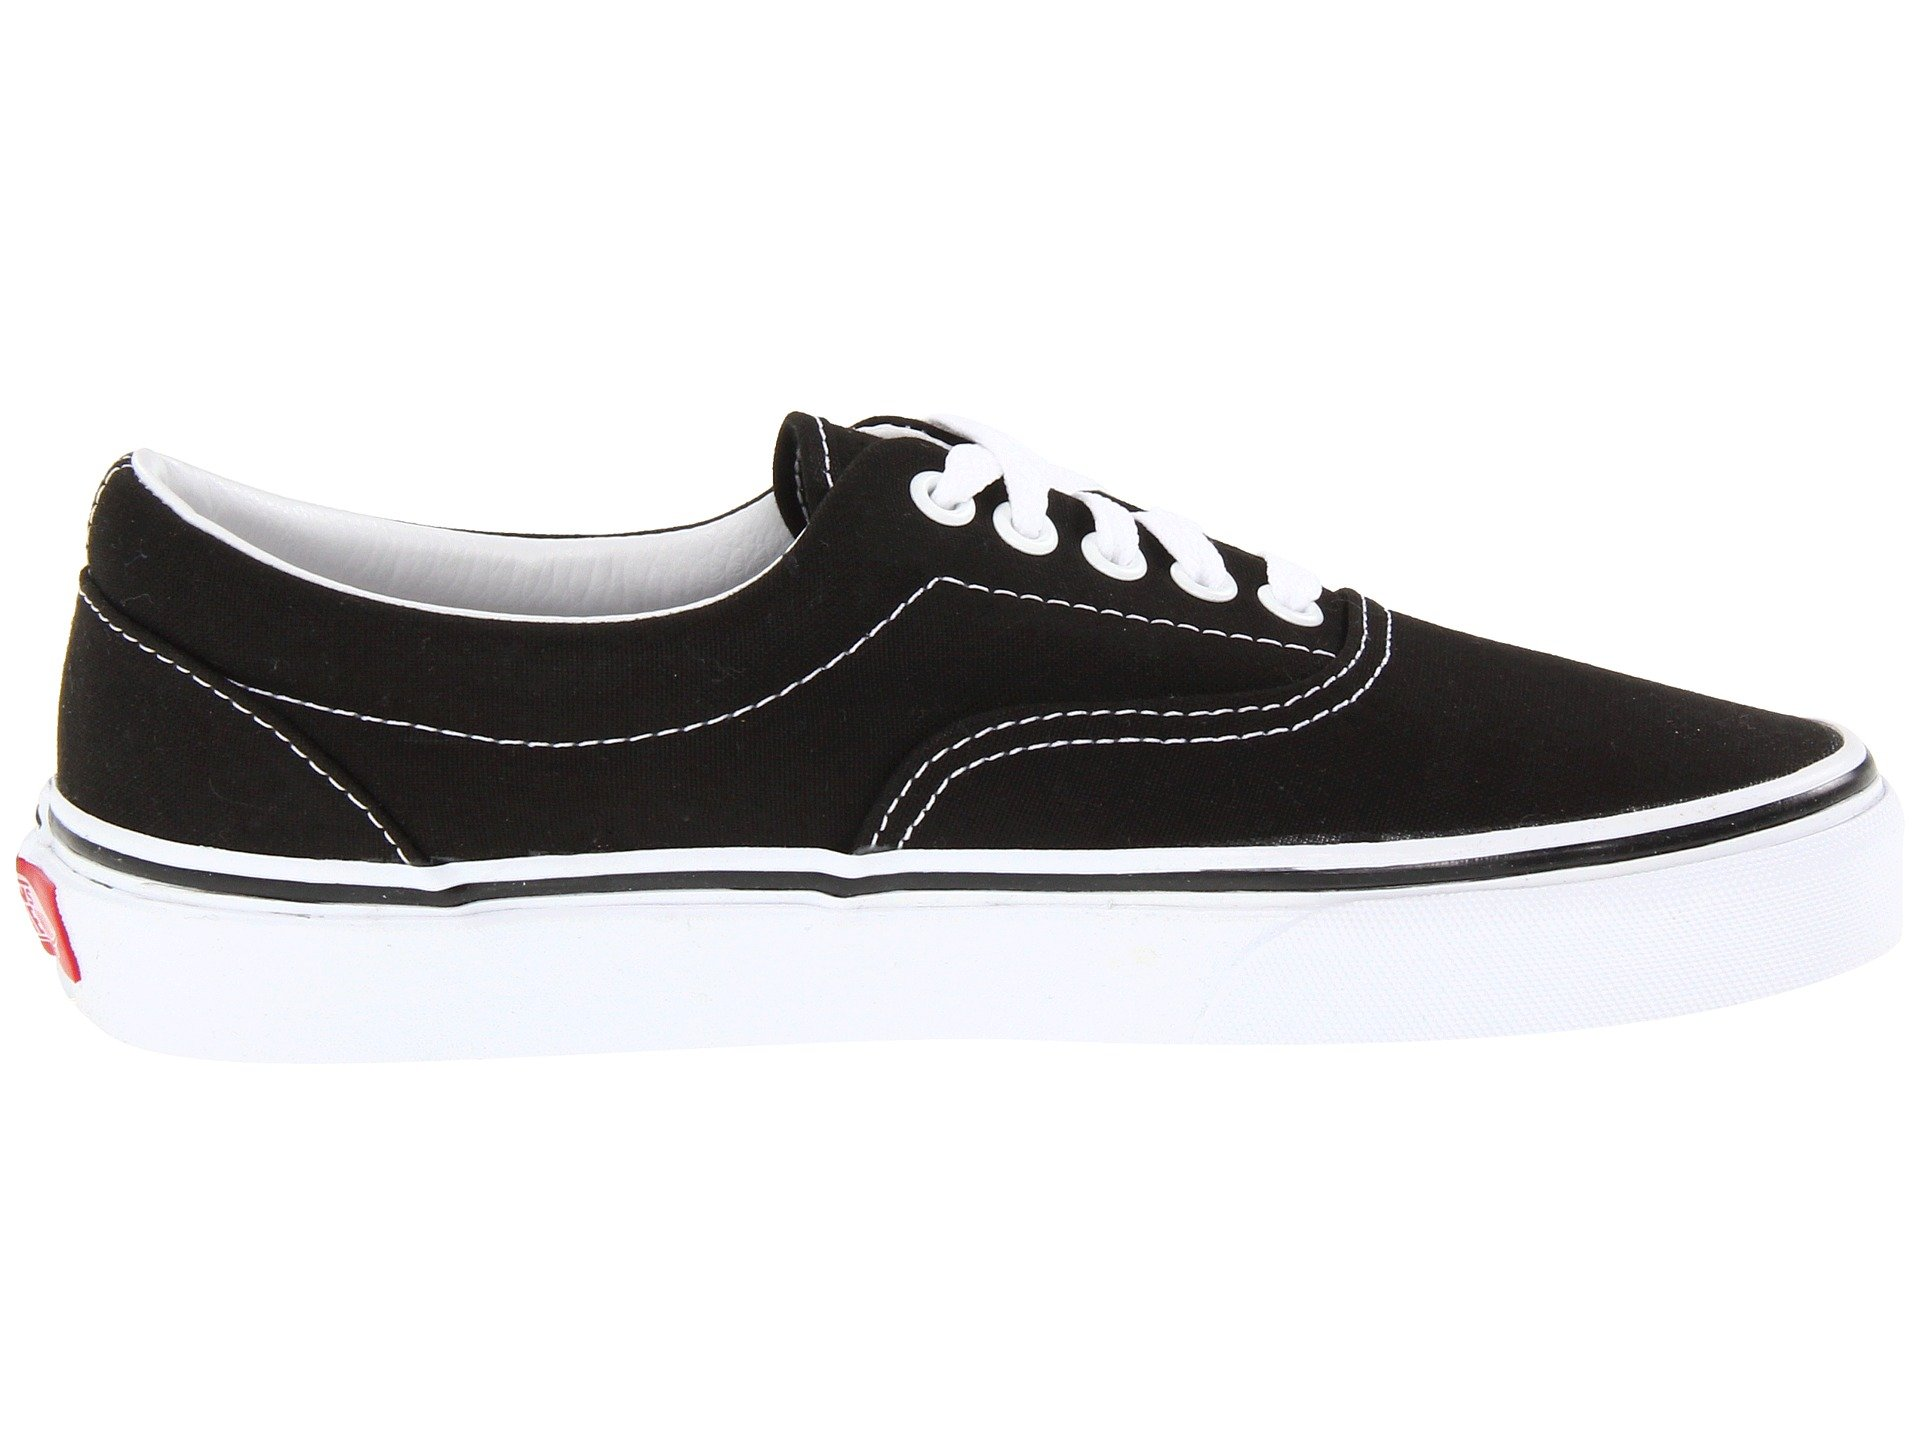 6d8487b9fae3 Buy vans sneakers zappos